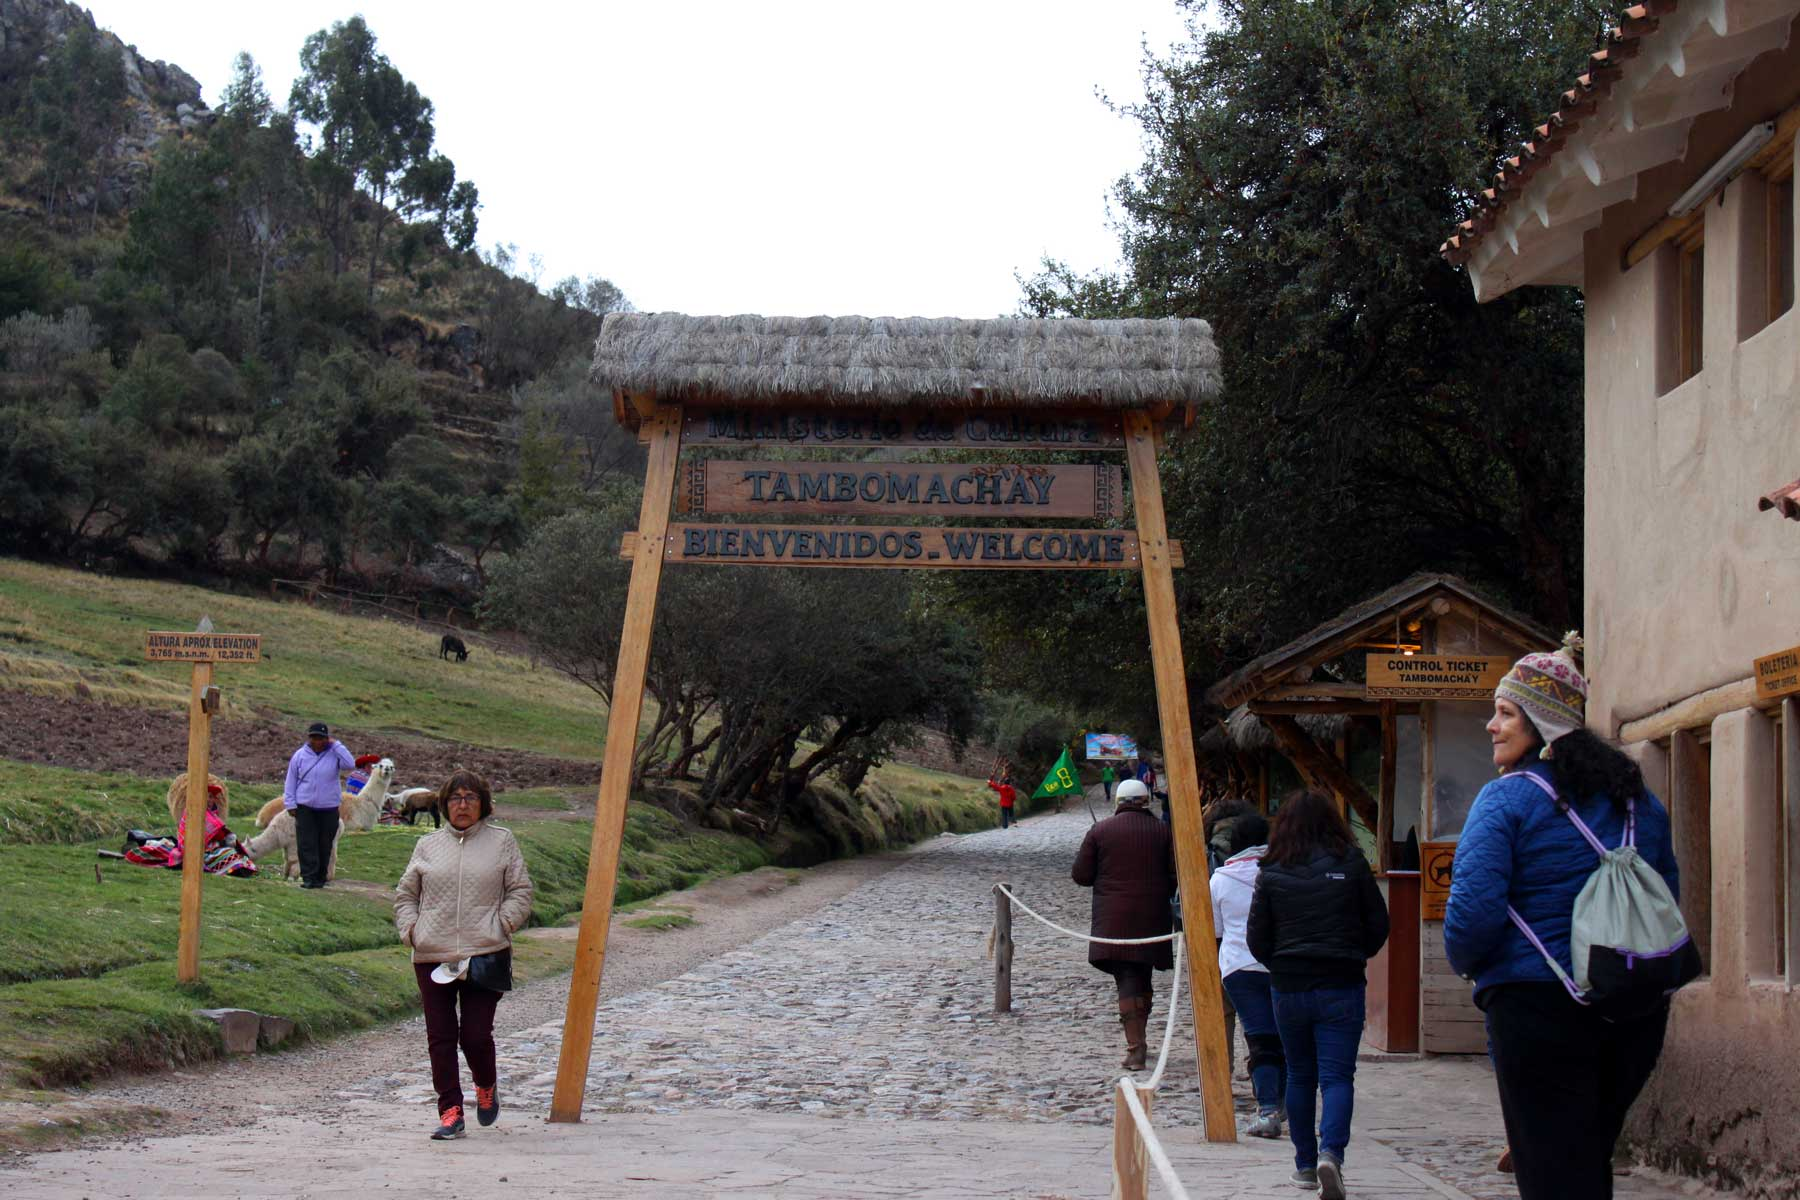 Entrance to Tambomachay